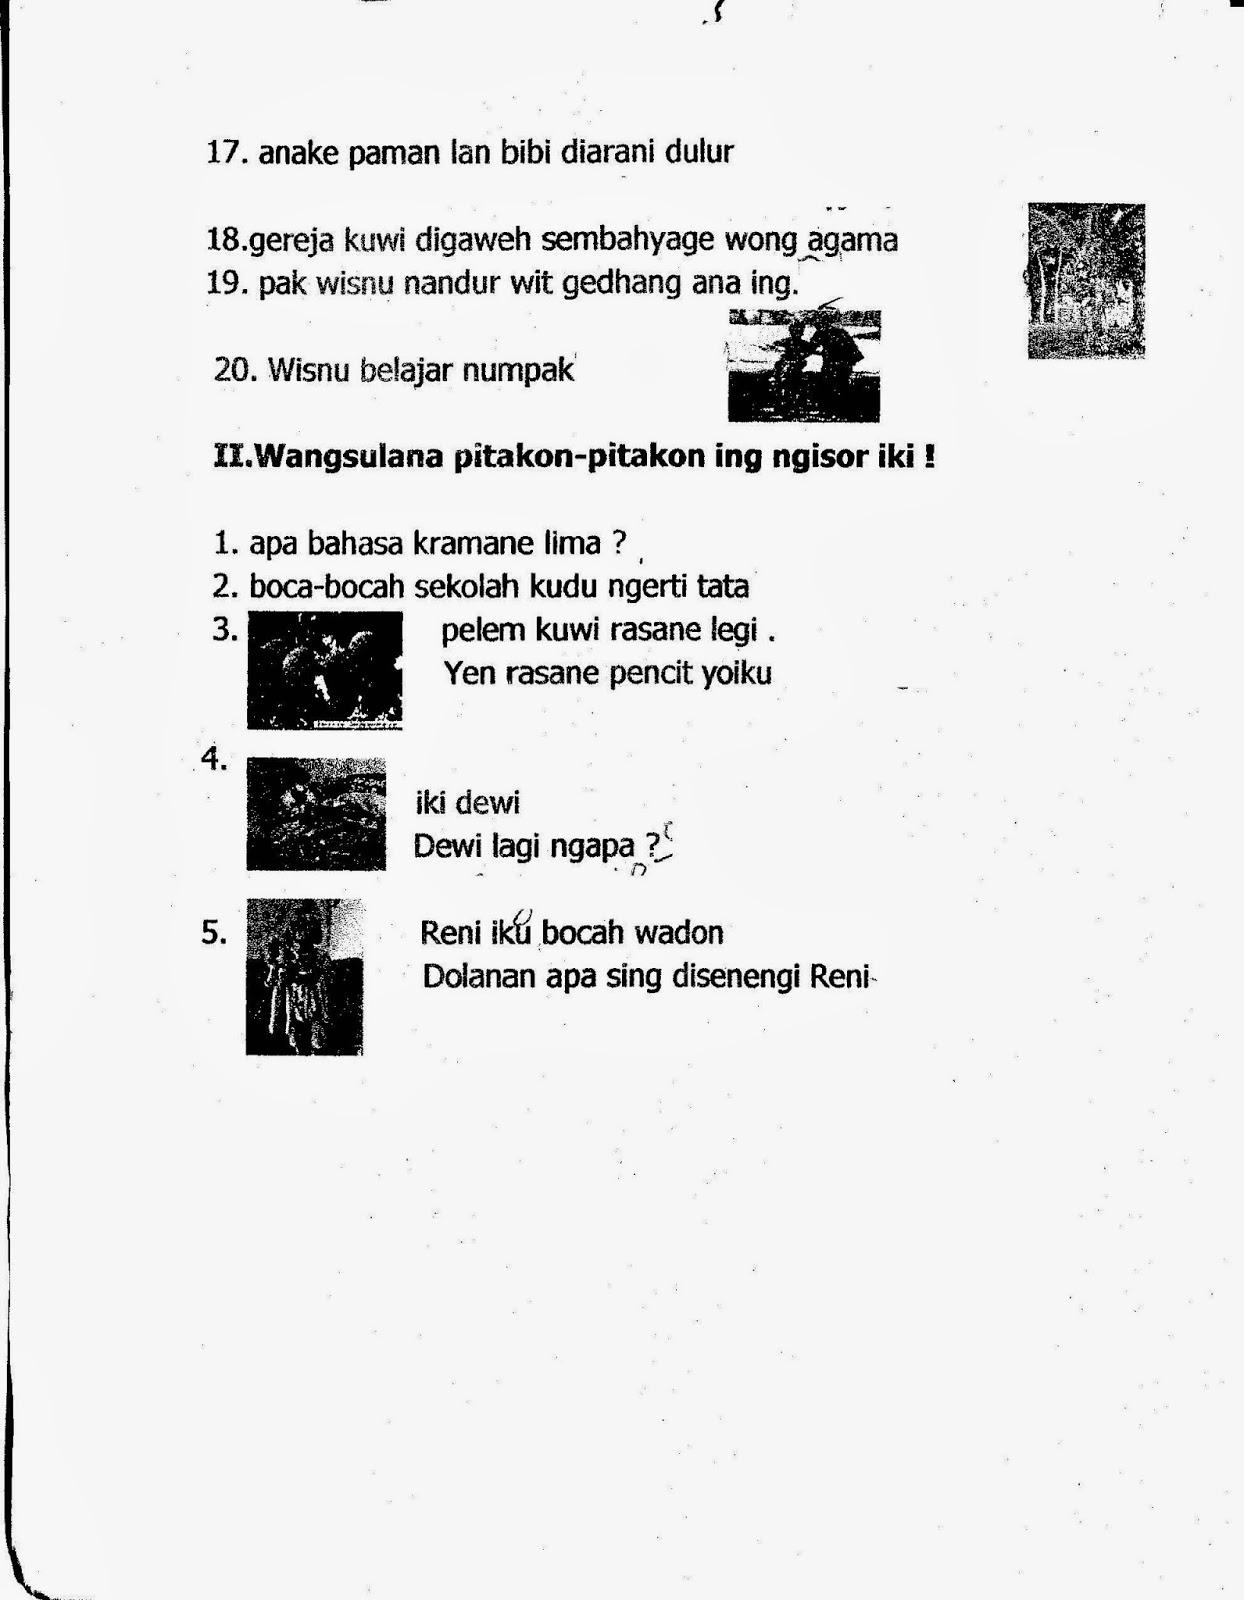 May 13, 2021 · detalhe kunci jawaban modul pengayaan bahasa inggris kelas 11 semester 2 pdf dapat kamu nikmati dengan cara klik link download. Pelajaran Bahasa Jawa Kelas 1 Sd Semester 2